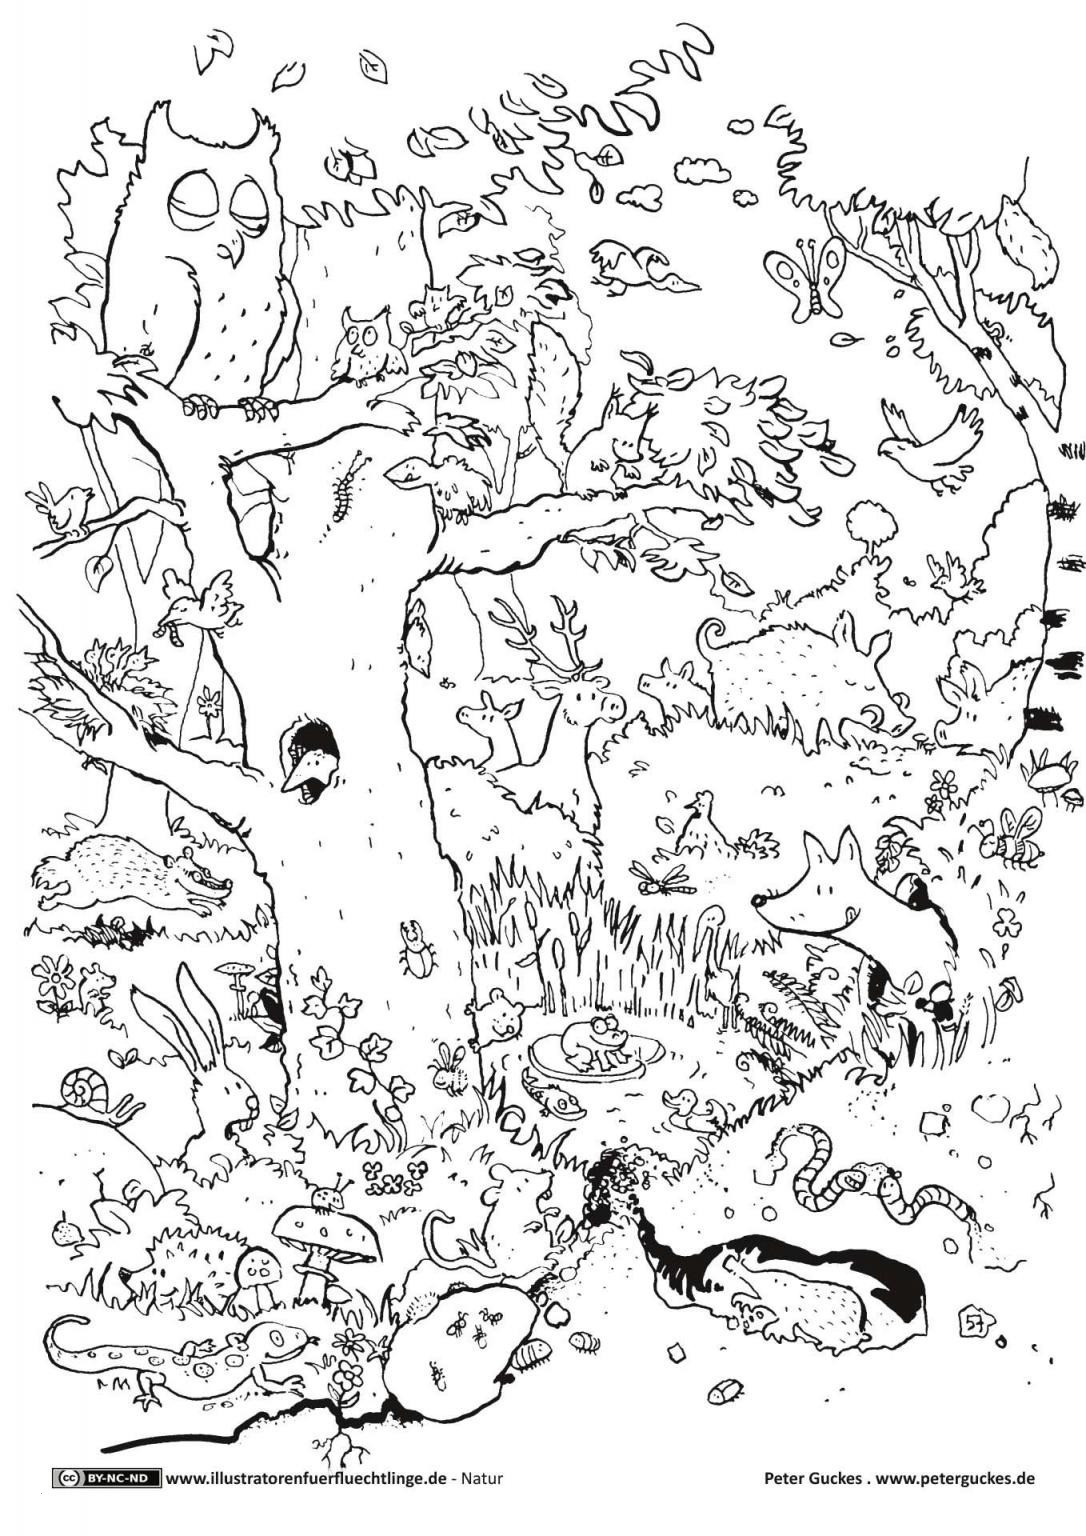 Mandala Zum Ausdrucken Rosen Neu Malvorlagen Igel Best Igel Grundschule 0d Archives Uploadertalk Das Bild